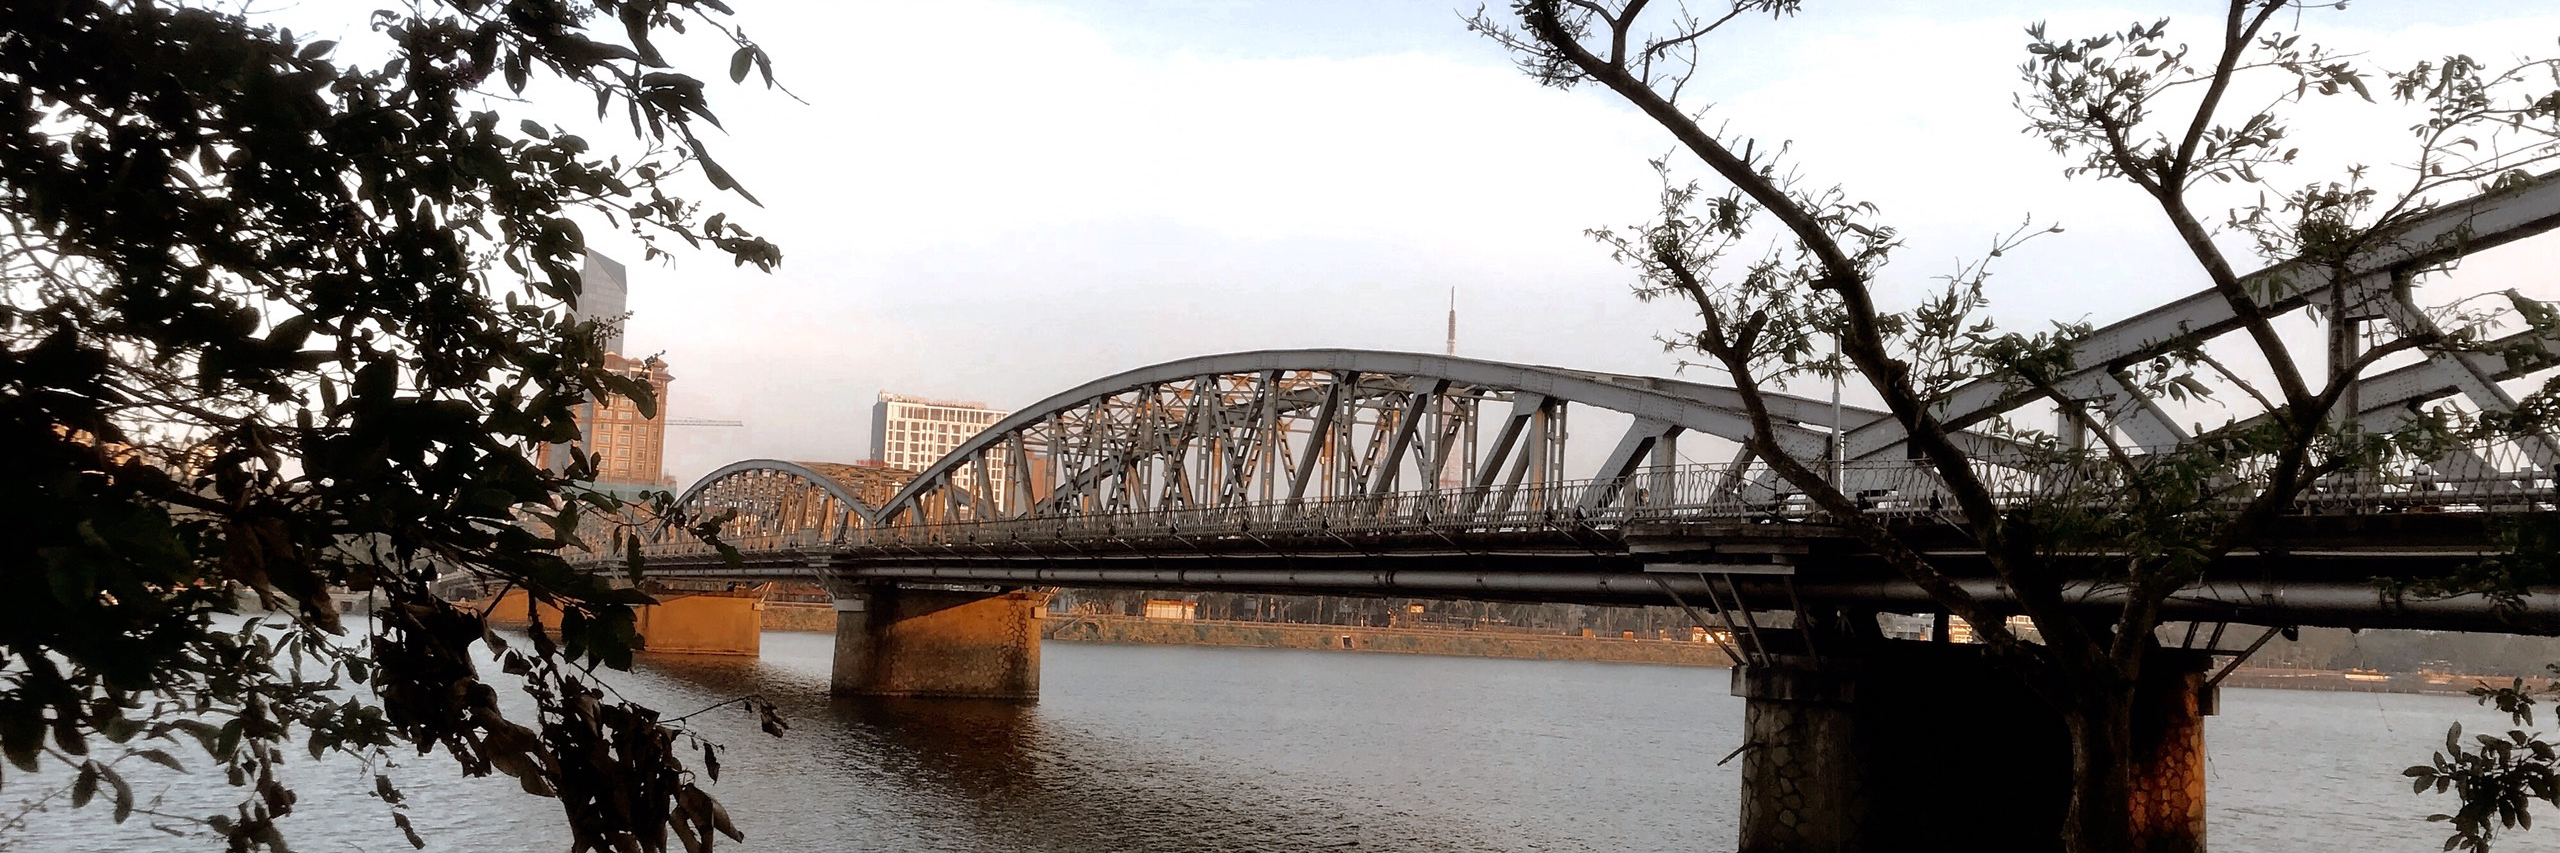 https://gody.vn/blog/congchua_mauhong803174/post/nhung-goc-pho-nen-tho-o-hue-8166